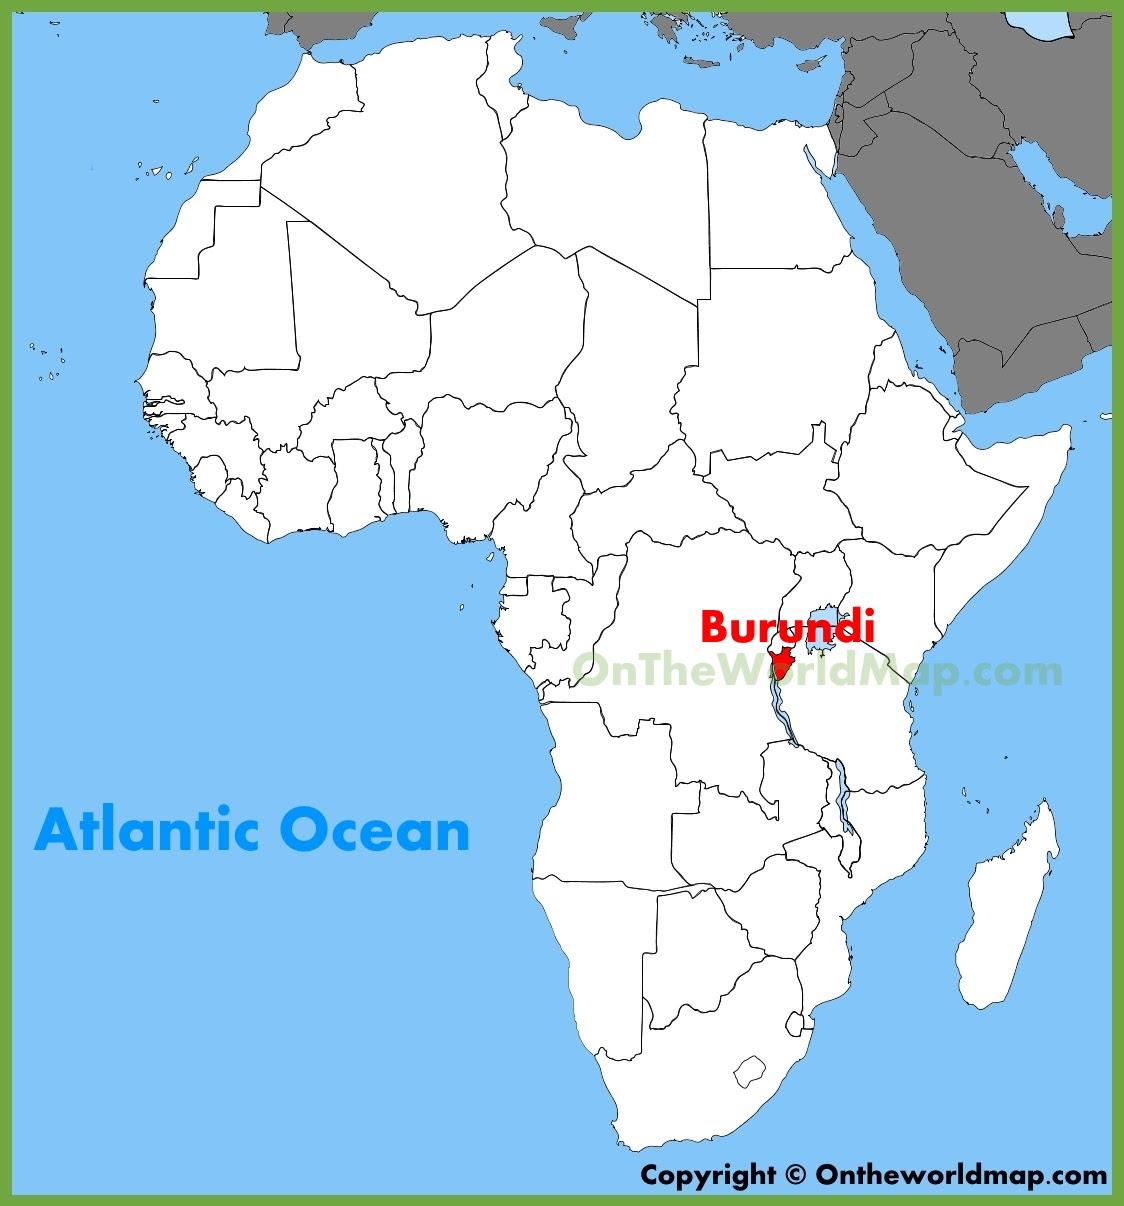 Where Is Burundi On The Map Of Africa Jungle Maps: Map Of Africa Burundi